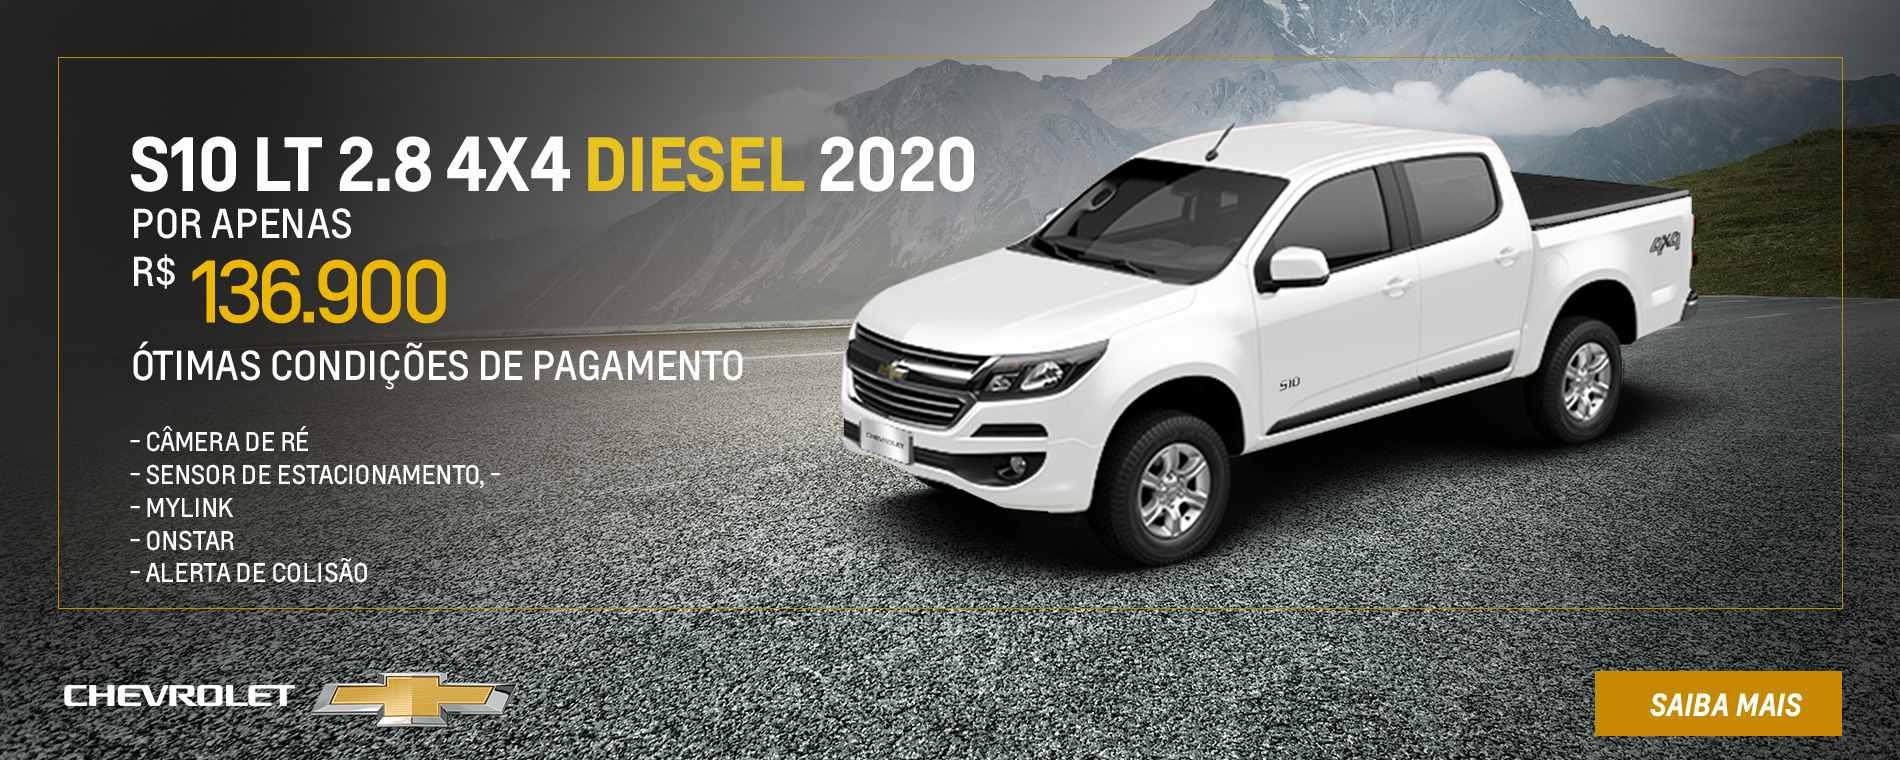 23_West-Motors_S10-LT-2.8-4X4-2020_DestaqueDesk